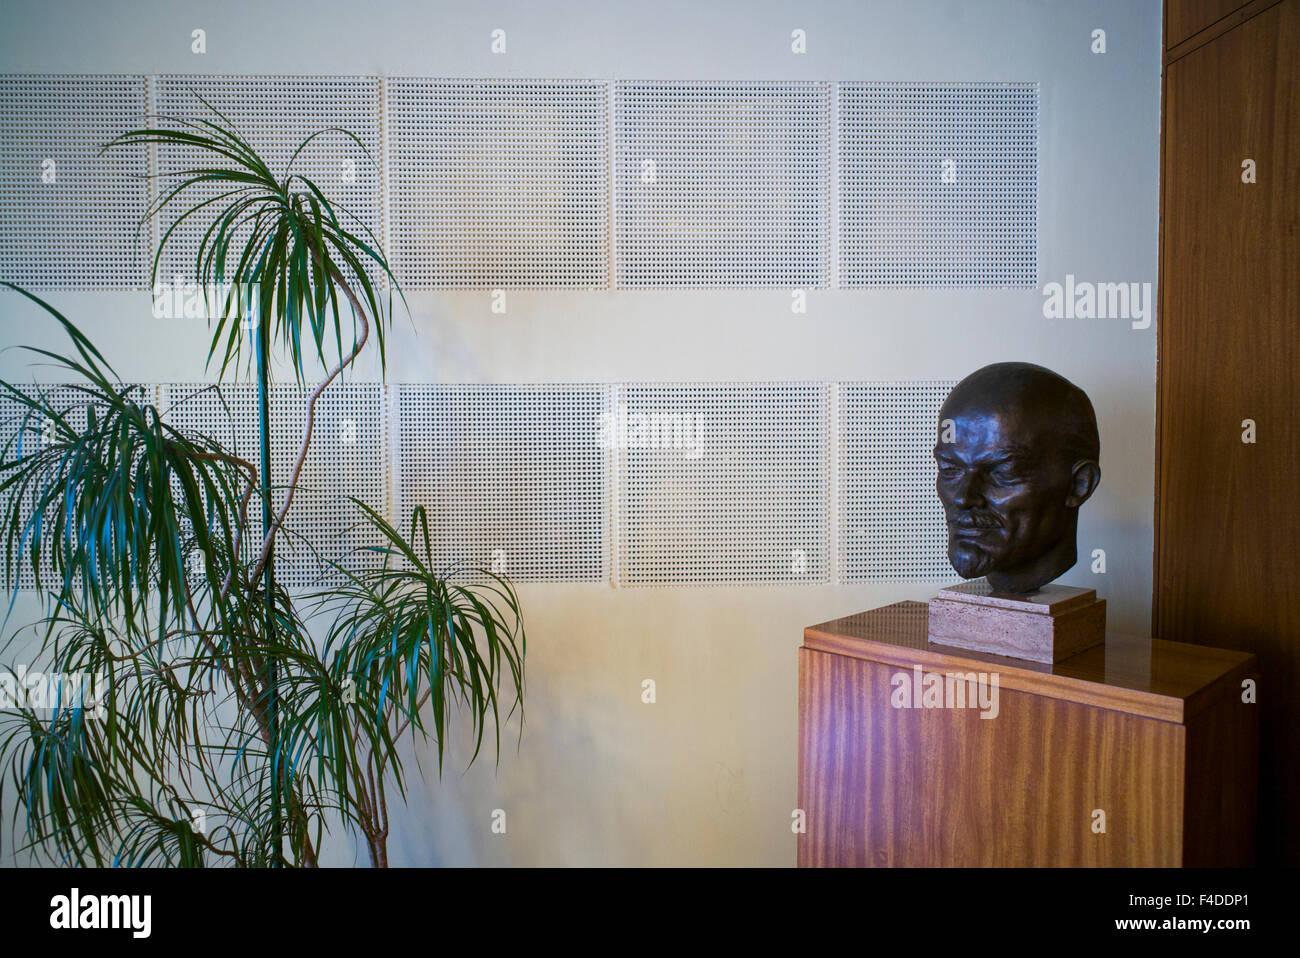 Germany, Berlin, Stasi Museum, DDR-era secret police museum in former secret police headquarters, bust of Lenin Stock Photo